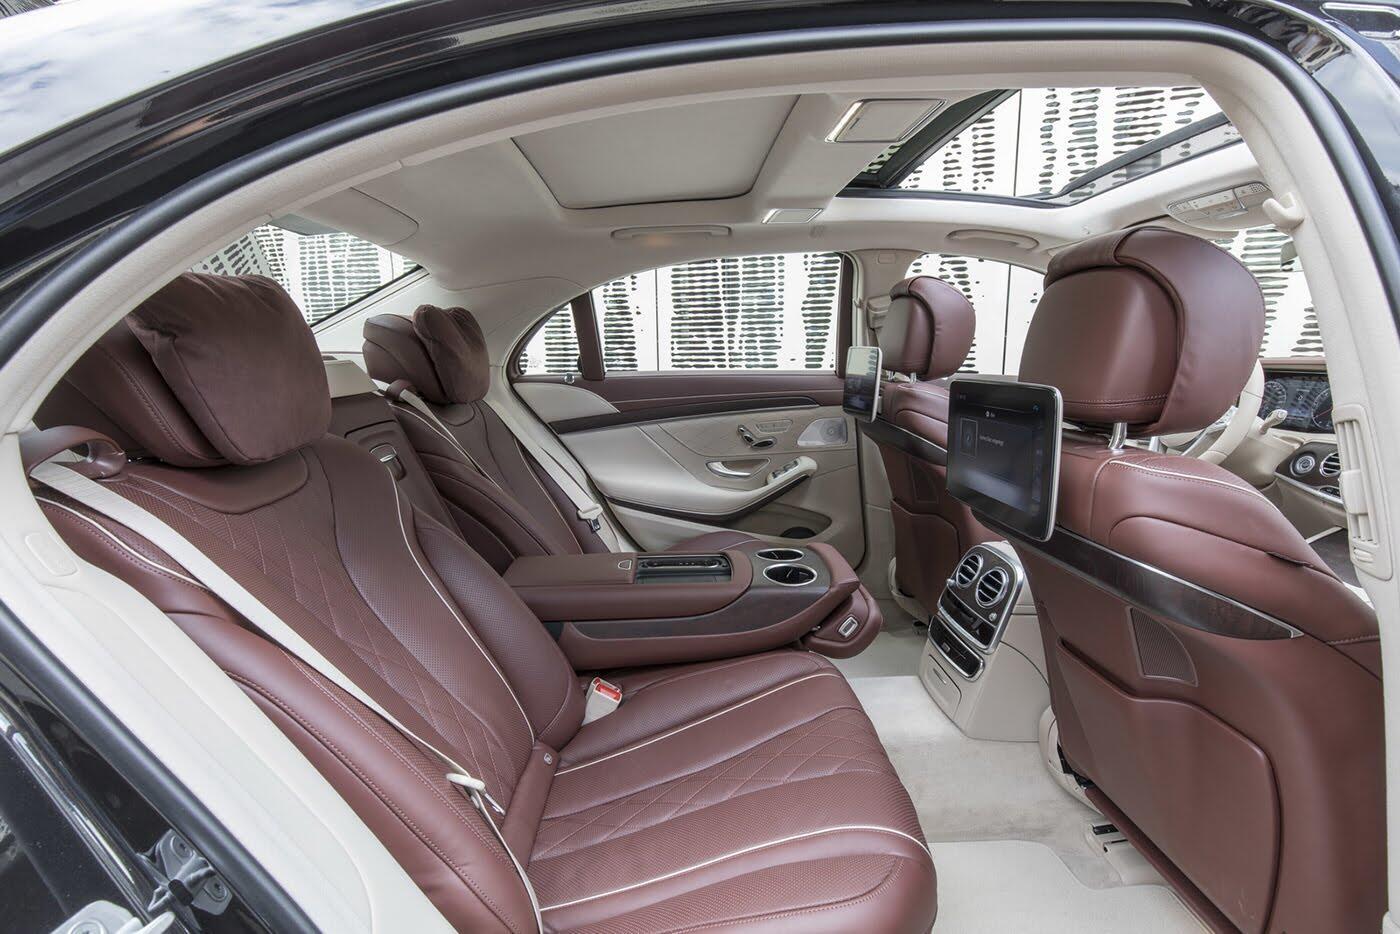 Ảnh chi tiết Mercedes-Benz S-Class 2018 - Hình 24